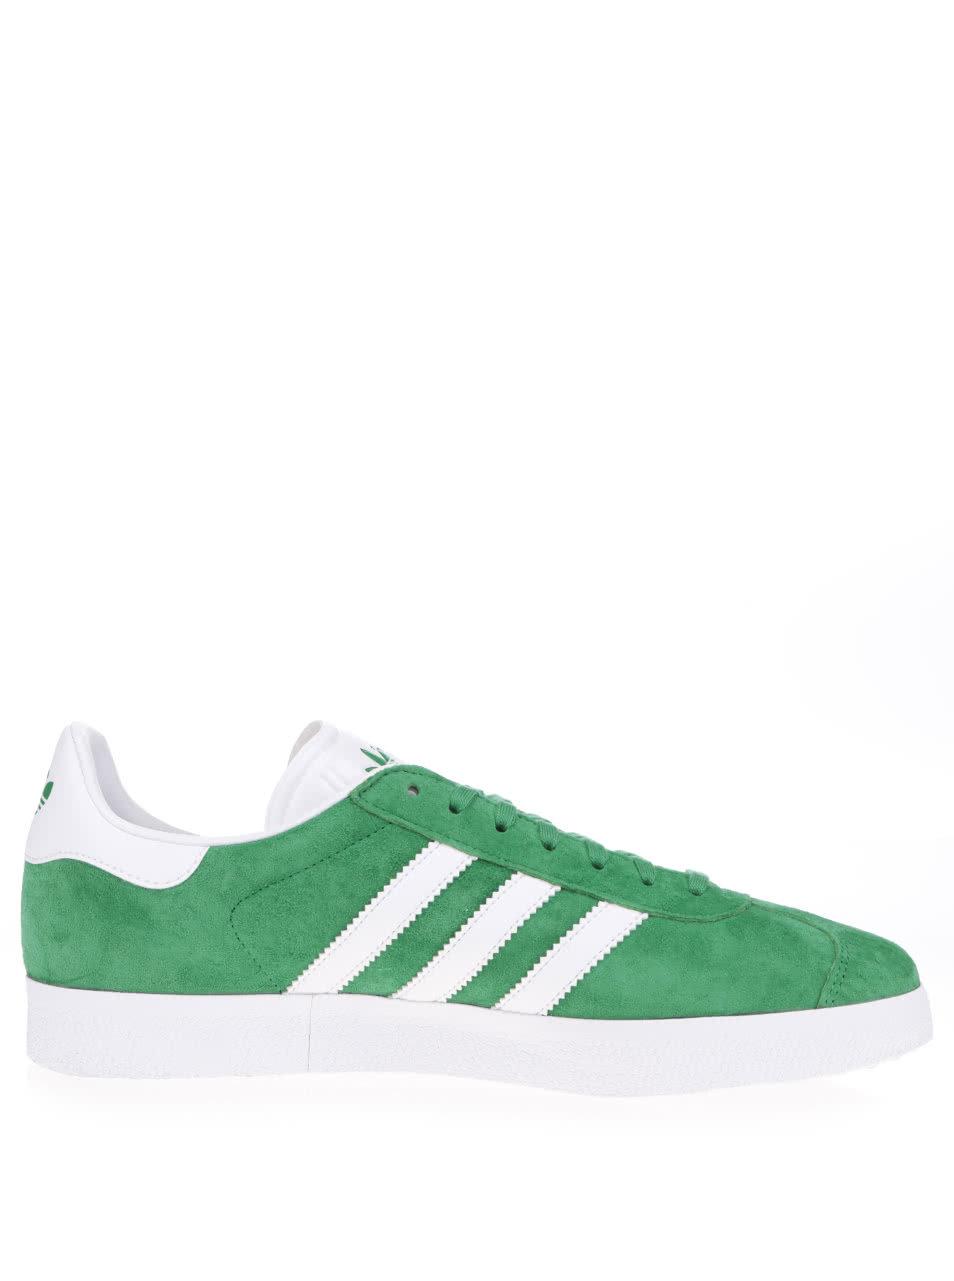 fc3cd1c3e69 Zelené pánské semišové tenisky adidas Originals Gazelle ...